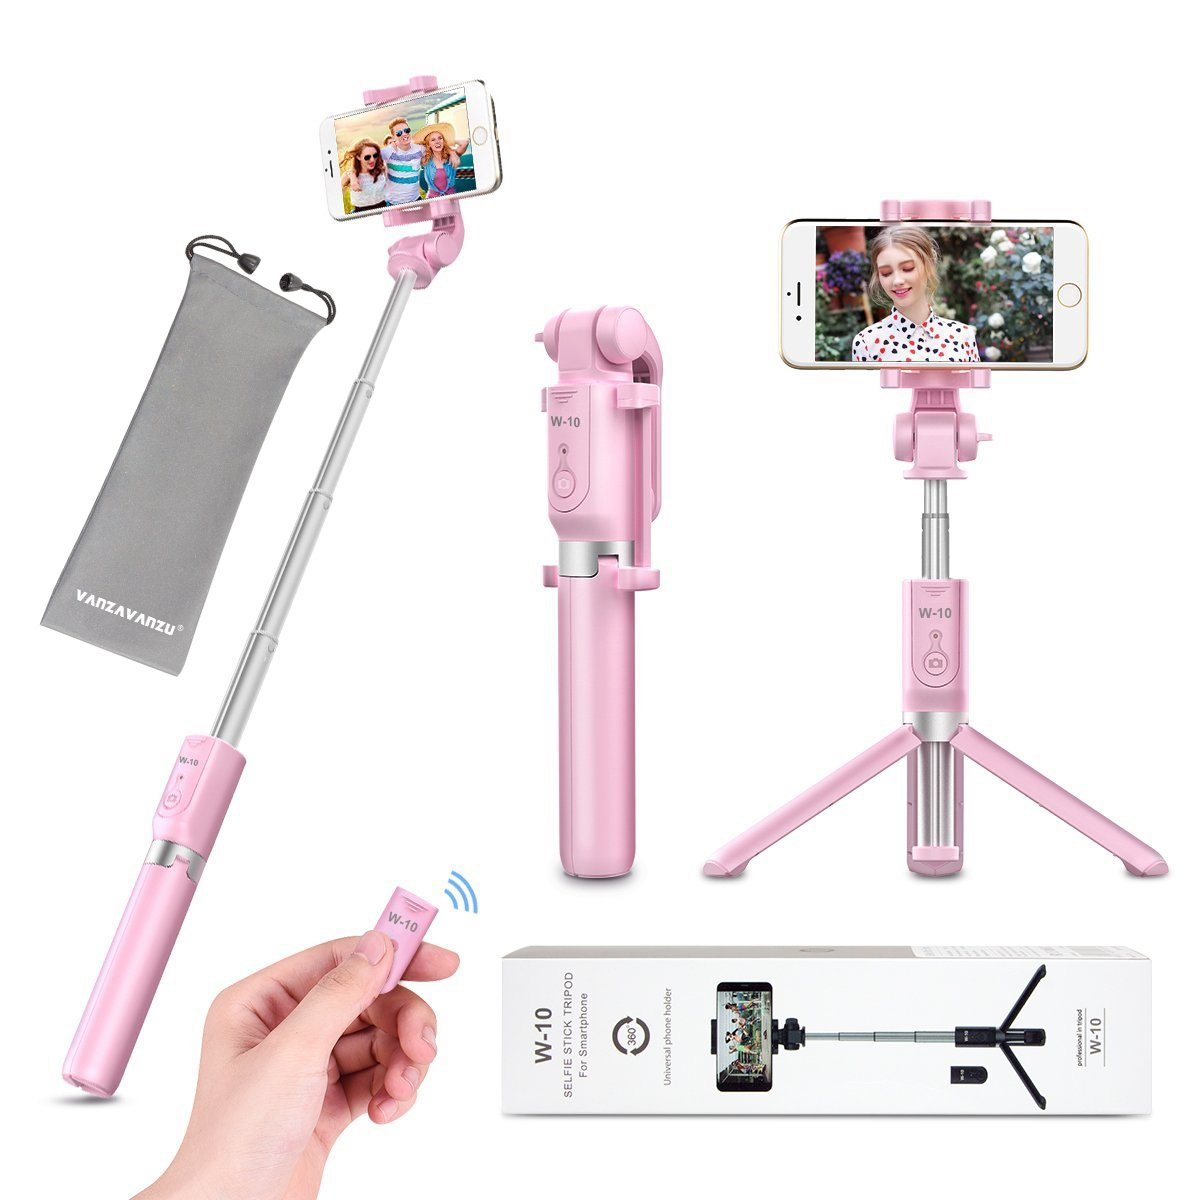 Selfie Stick Tripod with Remote Bluetooth - VANZAVANZU 2018 New Best Selfie Stick Monopod Tripod for iPhone X 6s 7 8 Plus Samsung s7 Edge, Podcast, Live Broadcasting, Facetime (Pink)